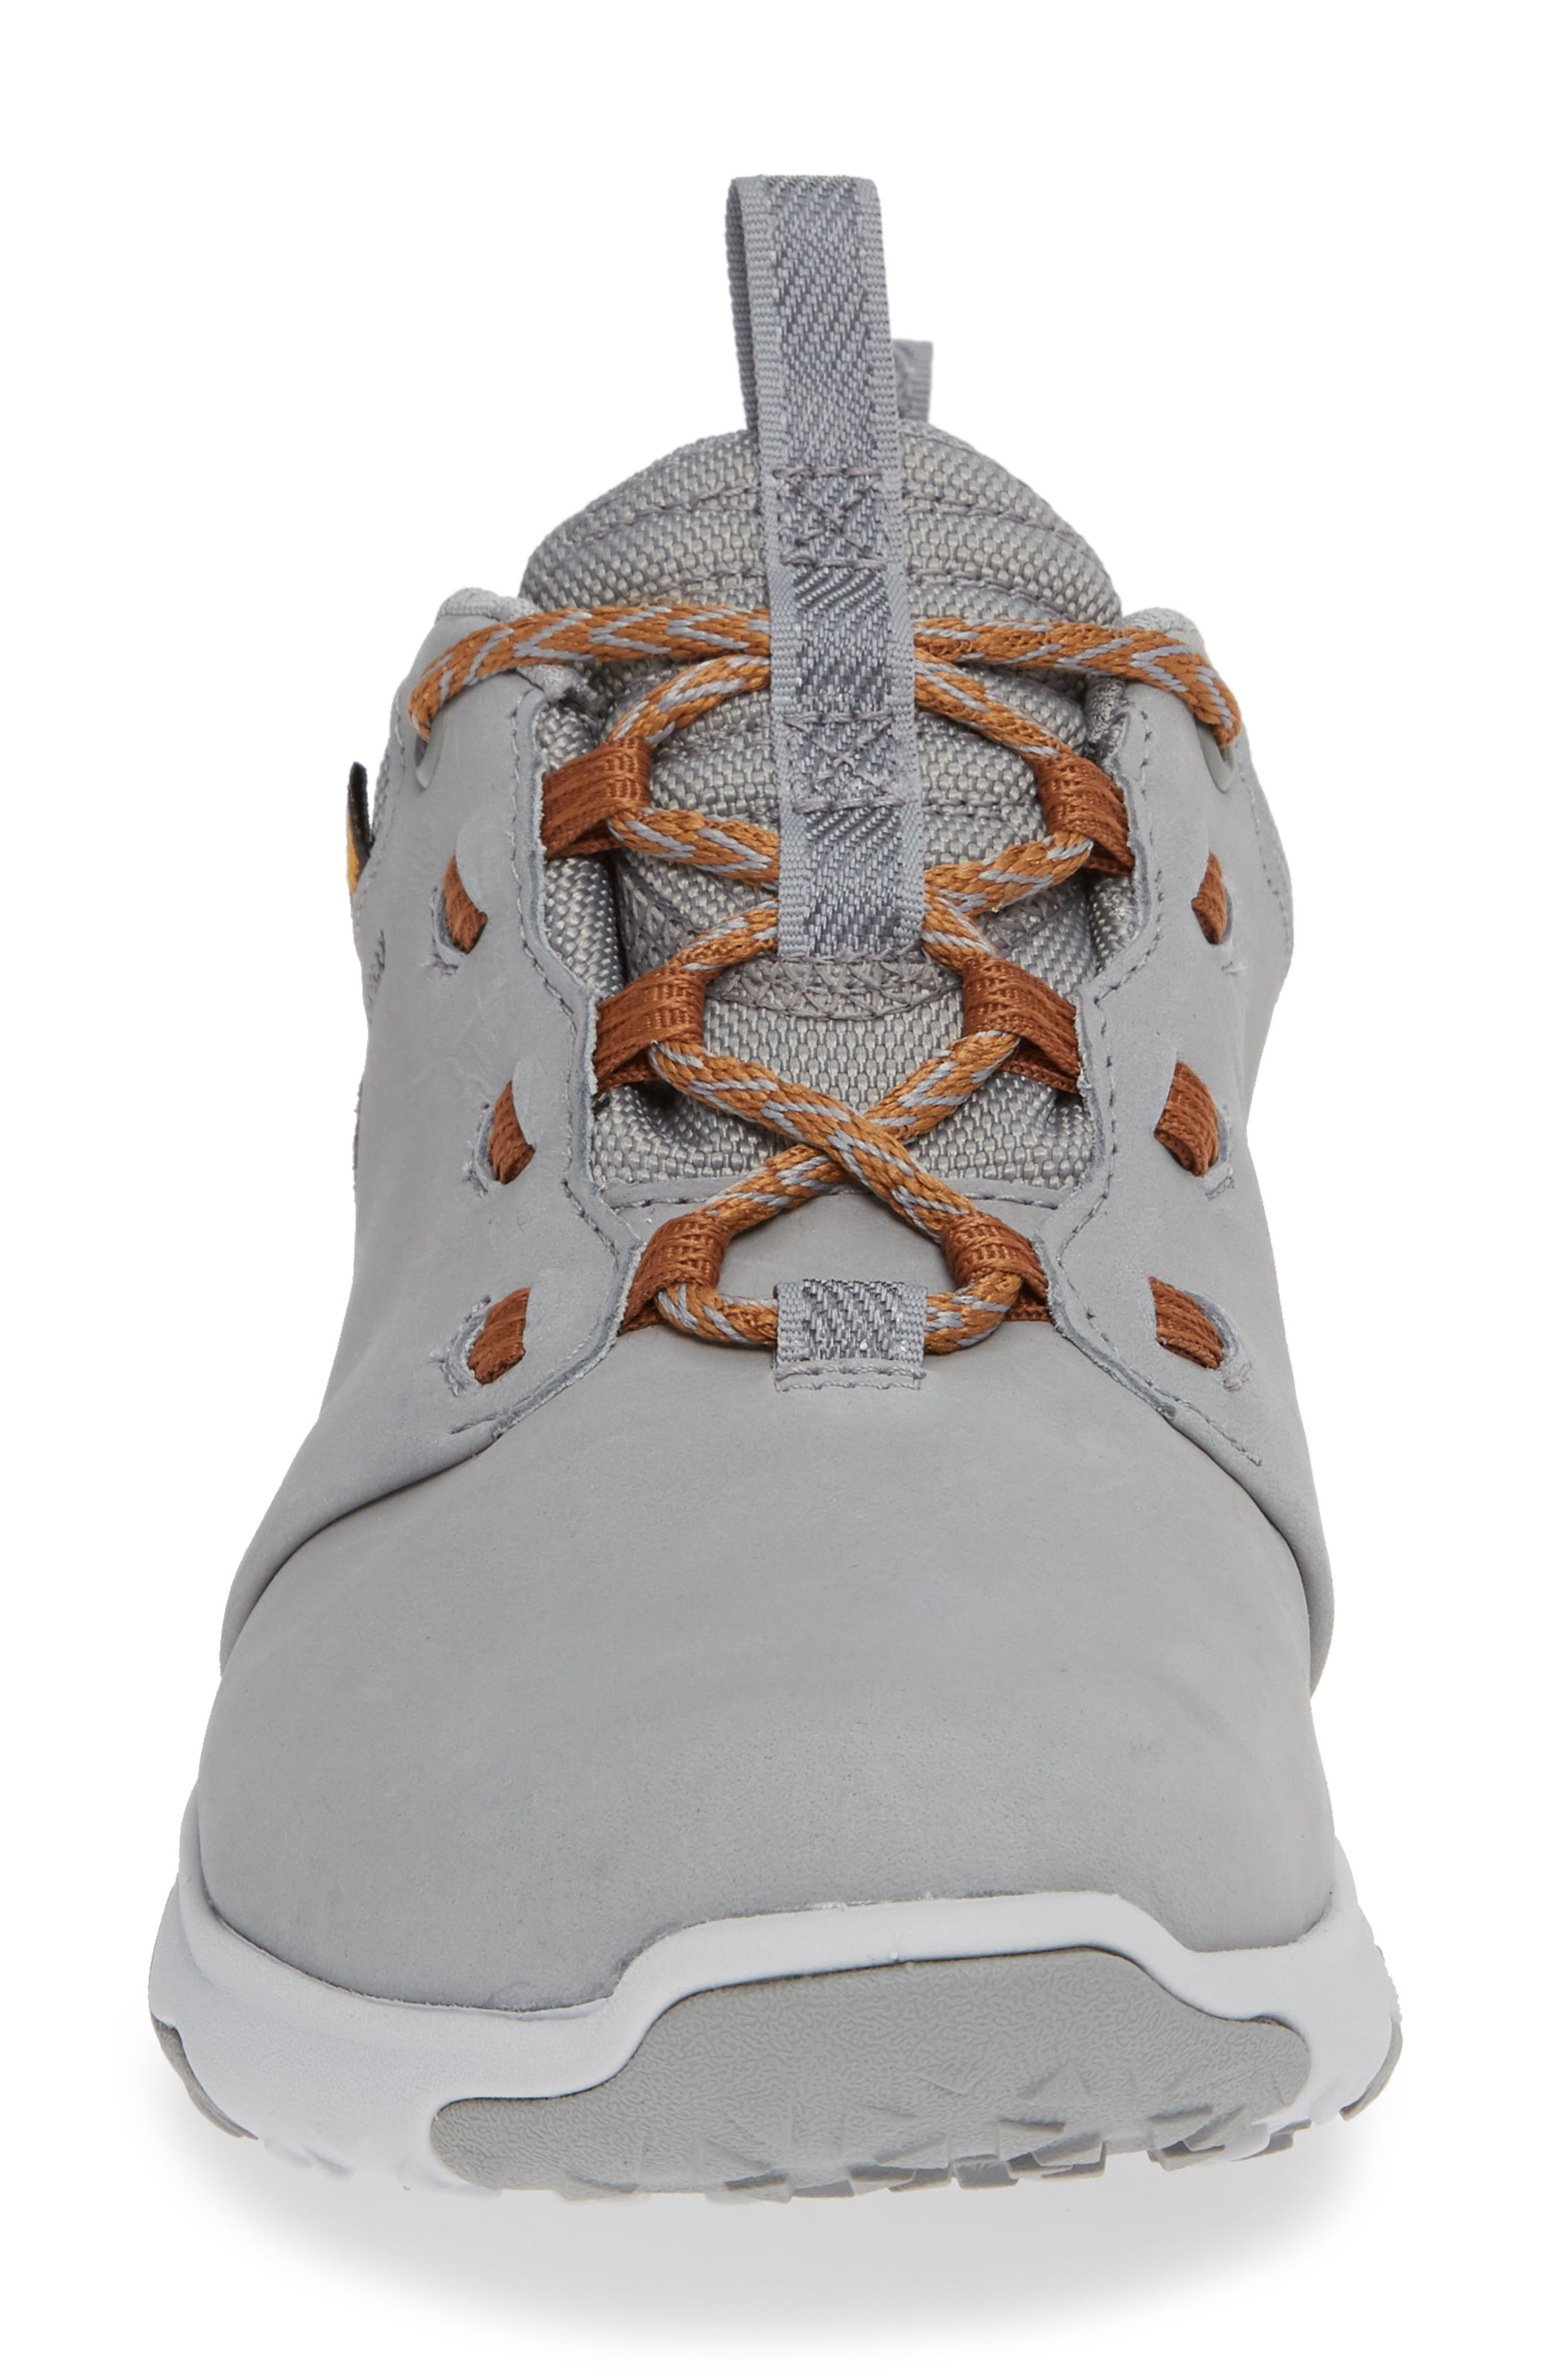 'Arrowood' Waterproof Sneaker,                             Alternate thumbnail 4, color,                             WILD DOVE LEATHER